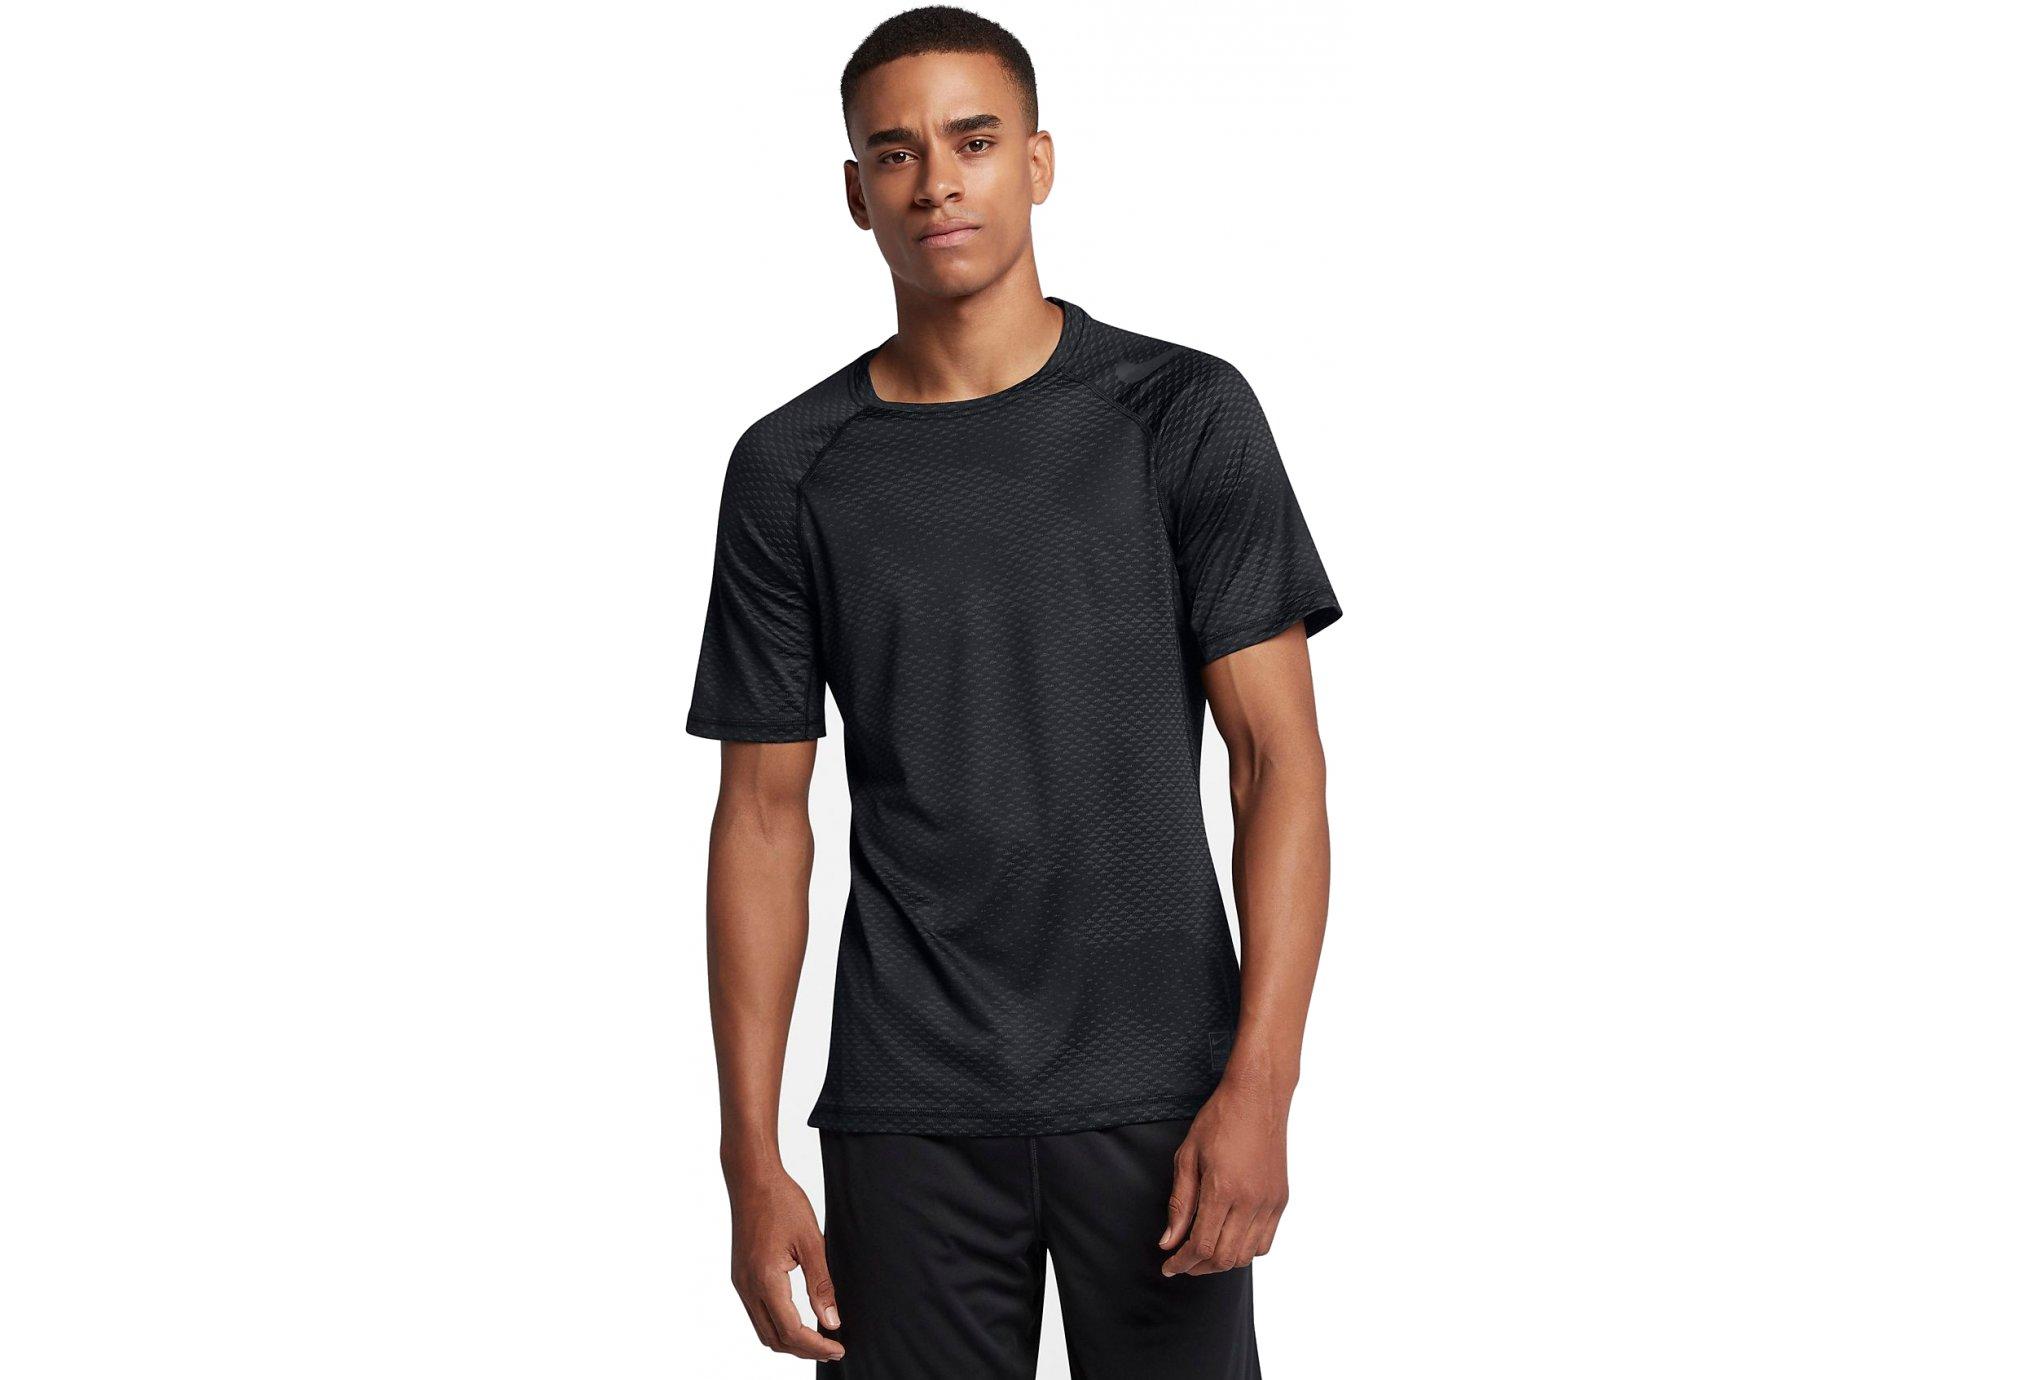 Trail Session - Nike Pro Hypercool M vêtement running homme 1646839e7b1d